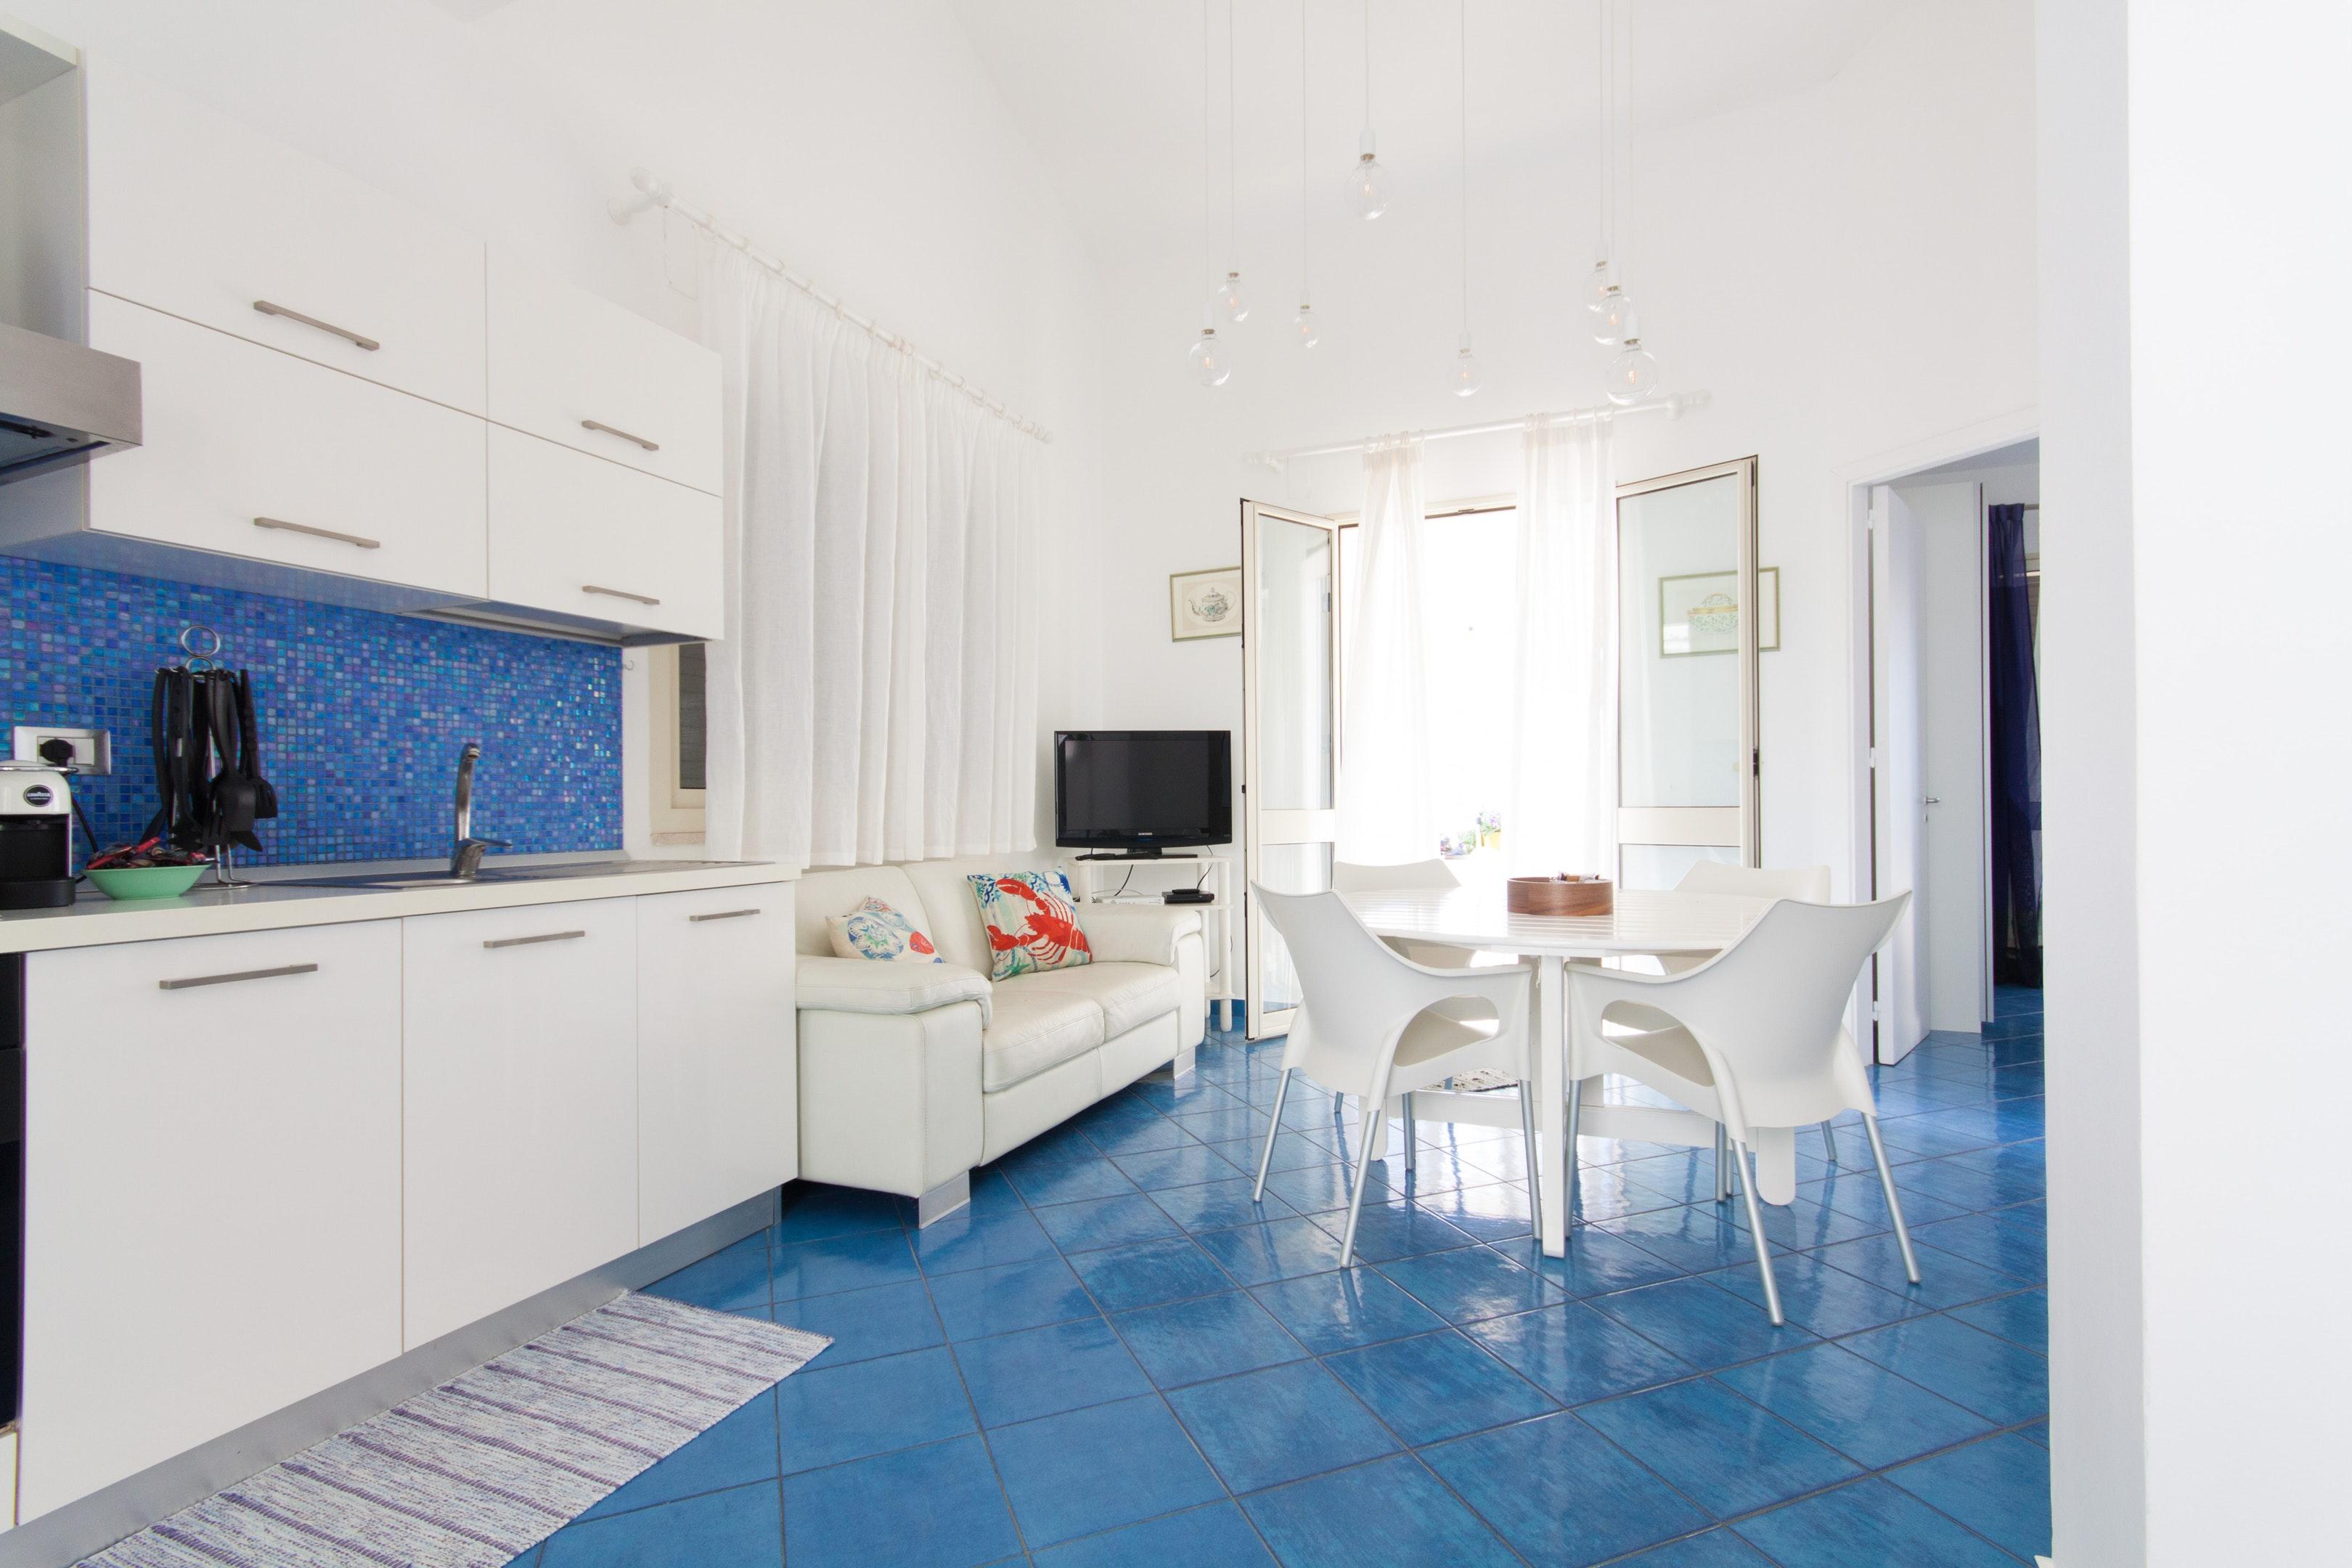 Holiday apartment Wohnung mit 3 Schlafzimmern in Piano di Trappeto mit herrlichem Meerblick, möblierter Terr (2271436), Balestrate, Palermo, Sicily, Italy, picture 9